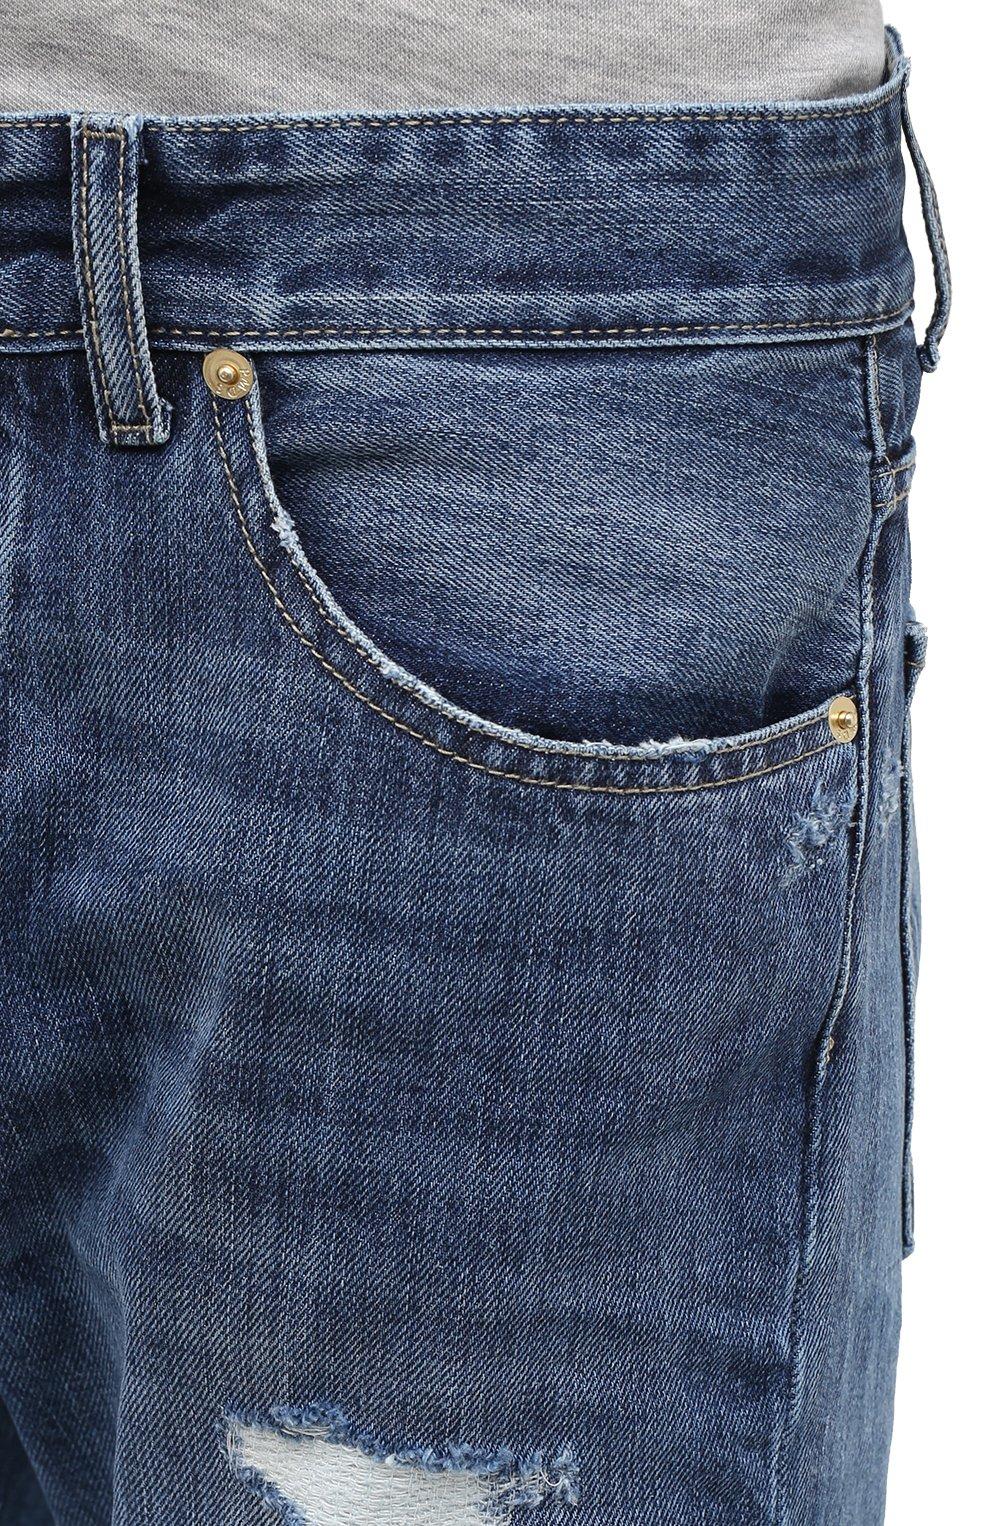 Мужские джинсы PREMIUM MOOD DENIM SUPERIOR синего цвета, арт. F21 352740215/BARRET | Фото 5